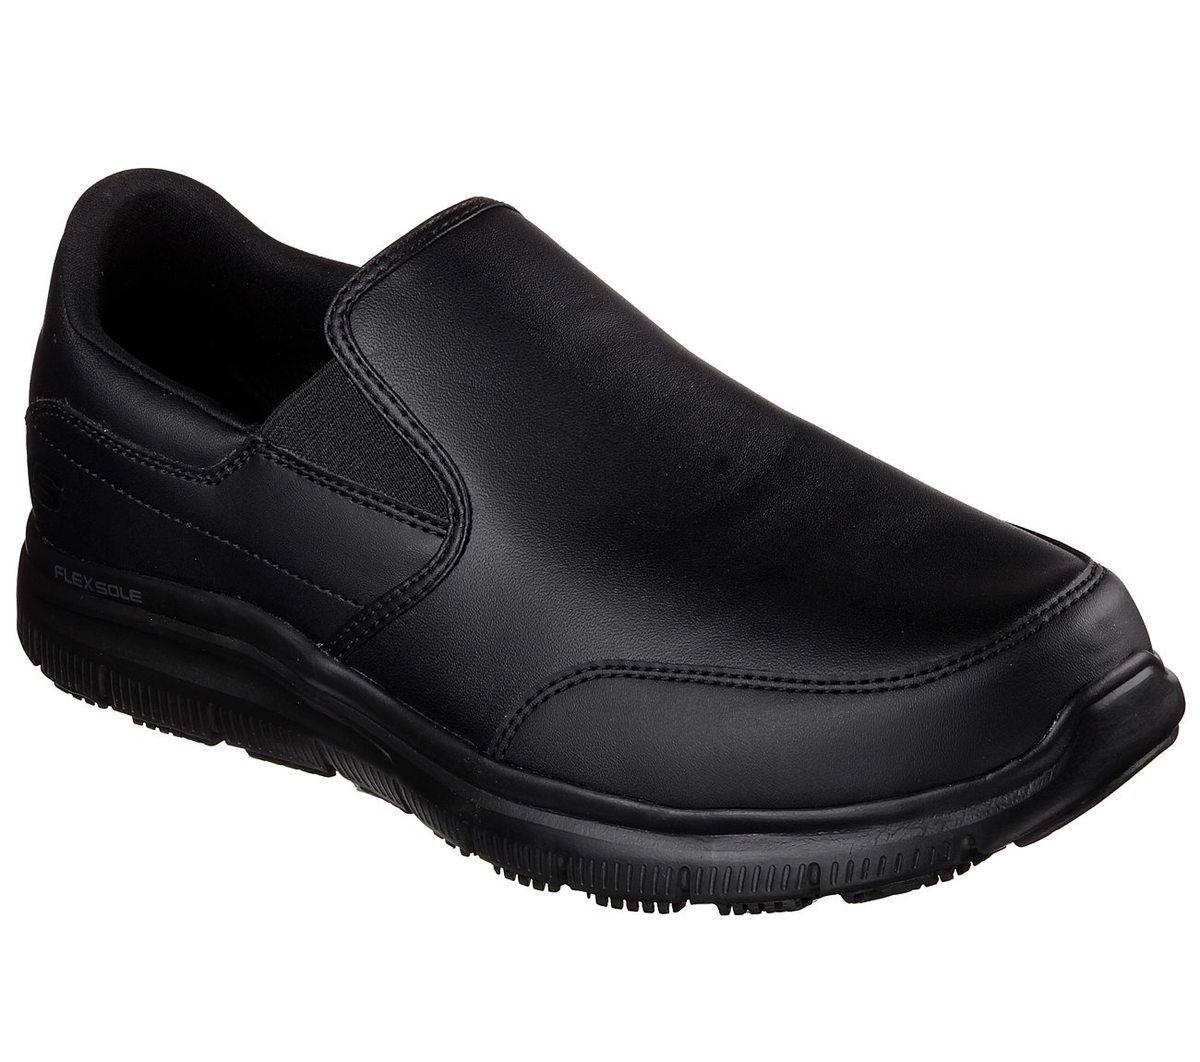 Skechers Work Leather 77071 Bbk Black Trainers